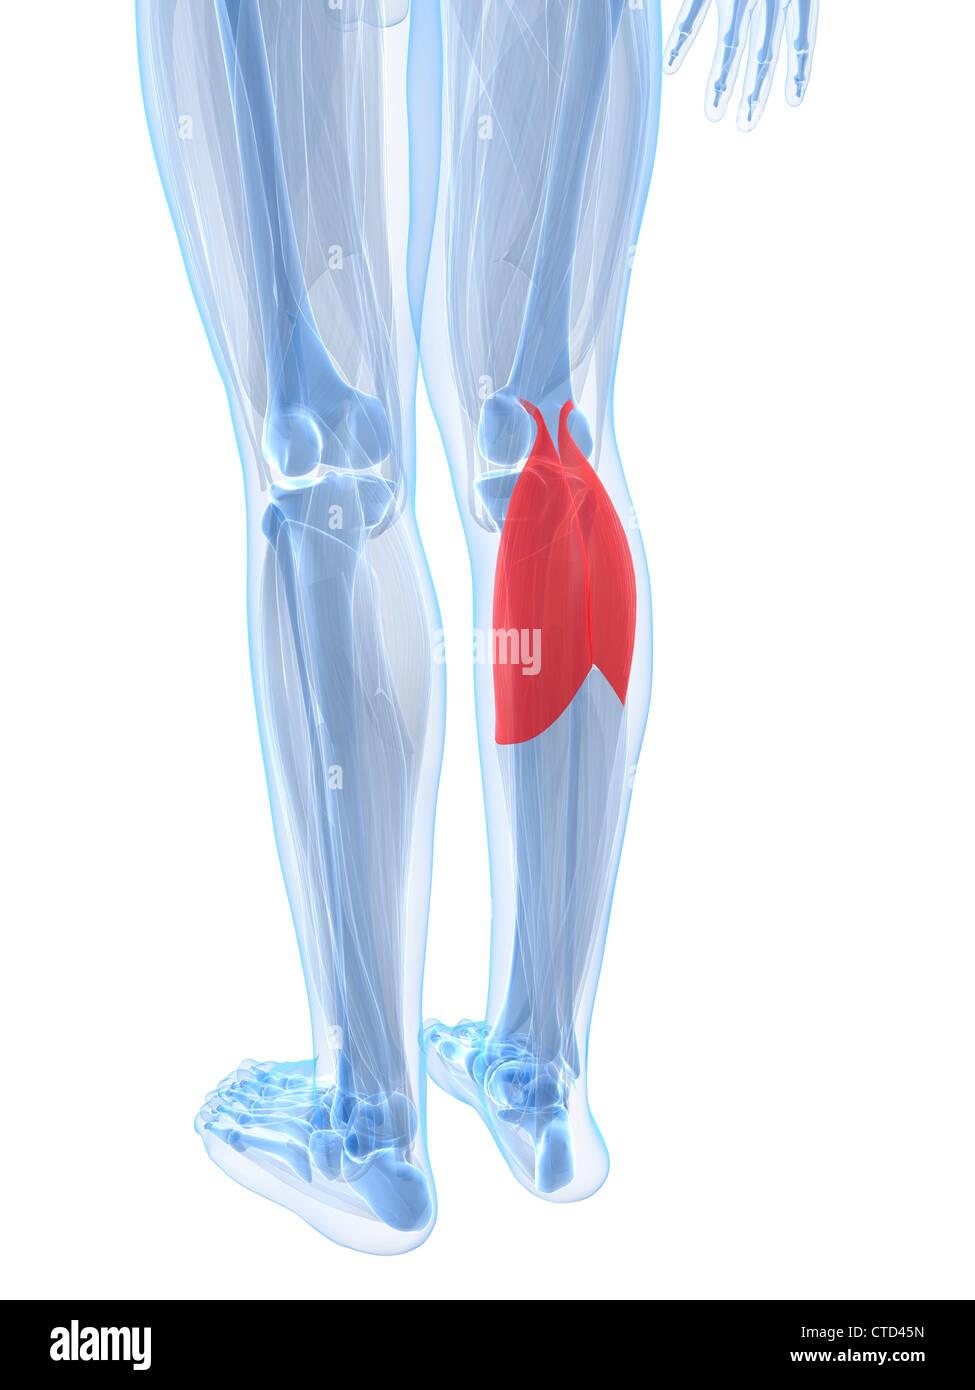 Calf muscles  artwork - Stock Image